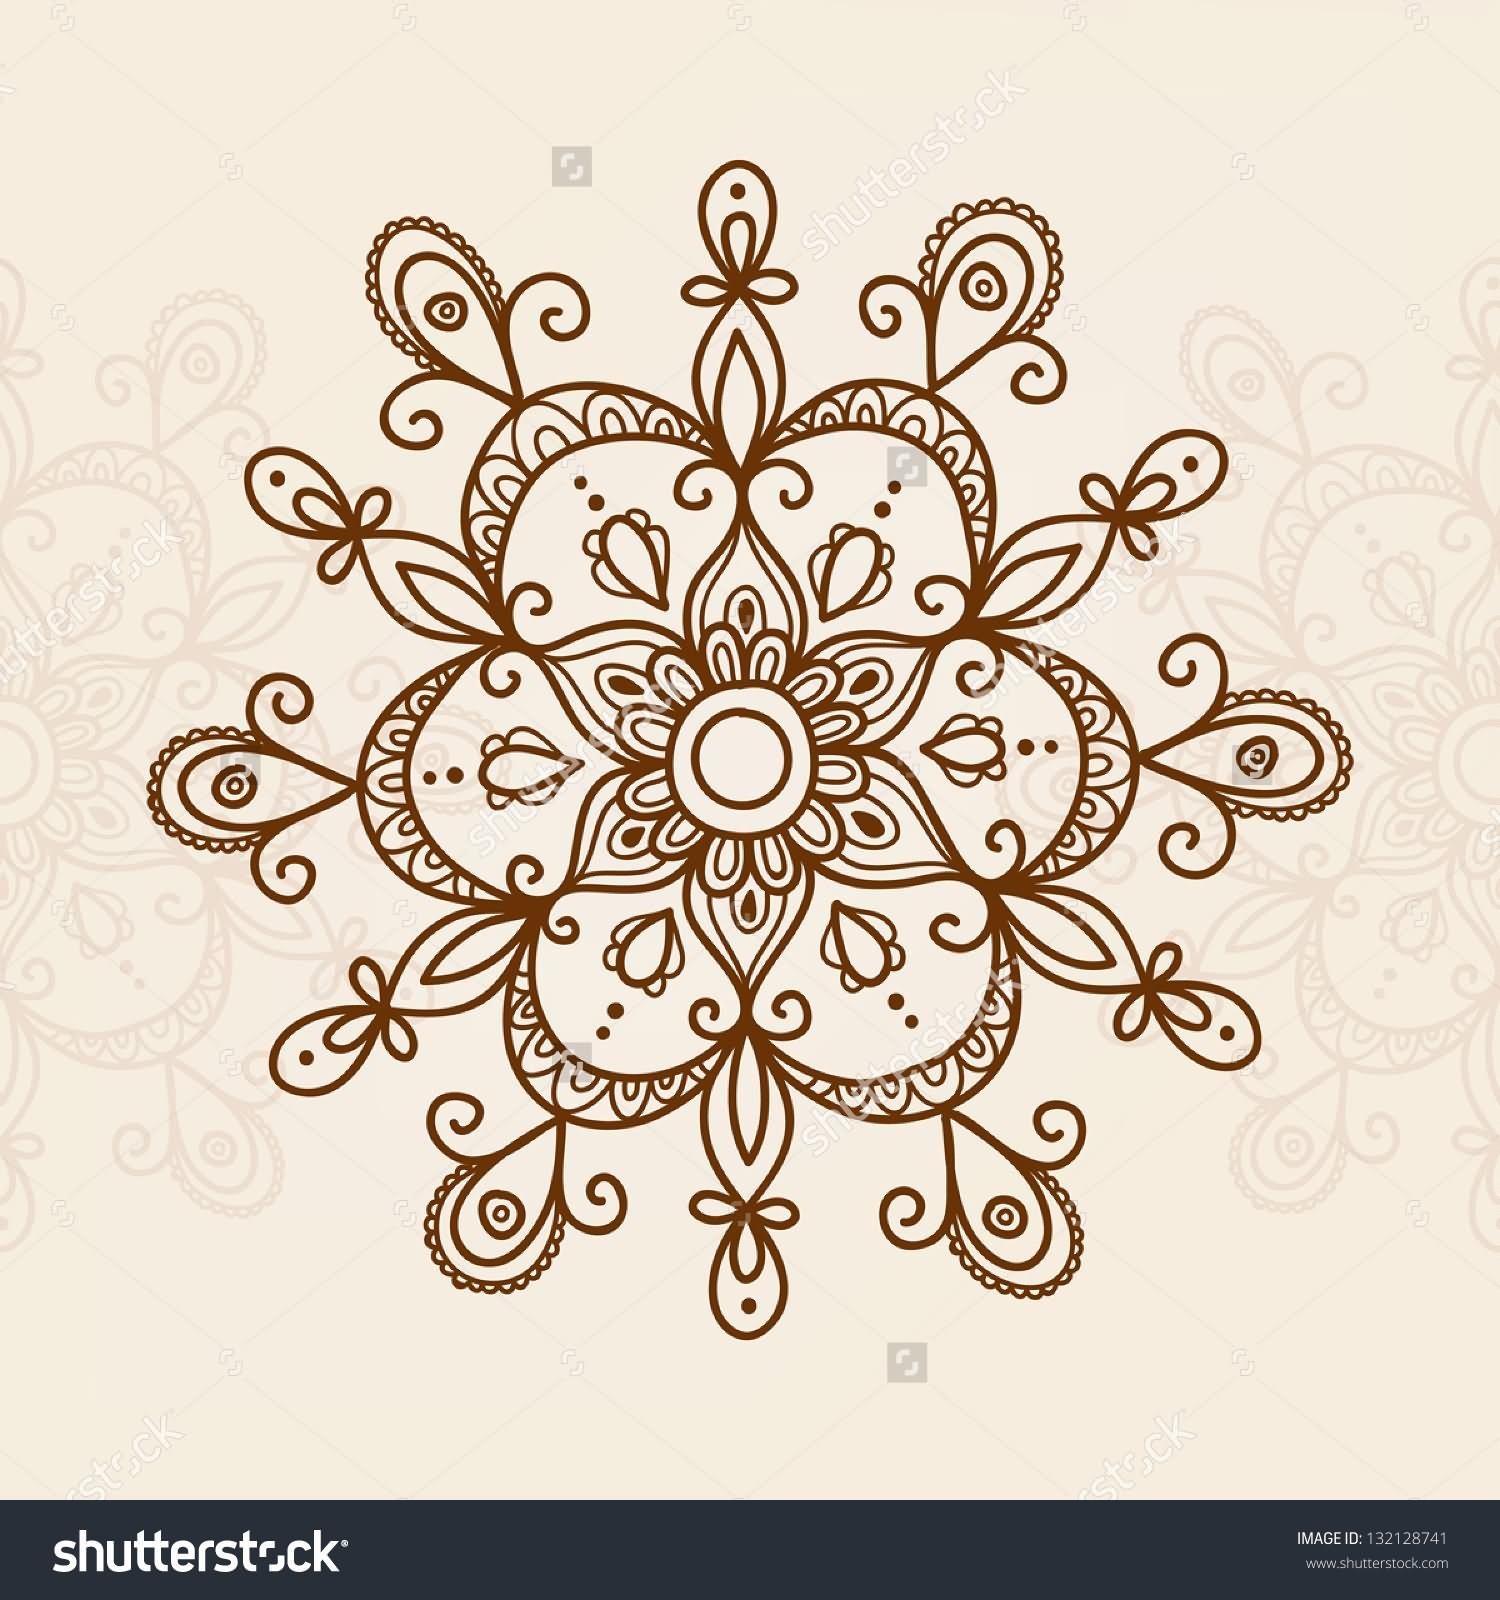 83a2ee1f5 12+ Beautiful Henna Tattoo Designs